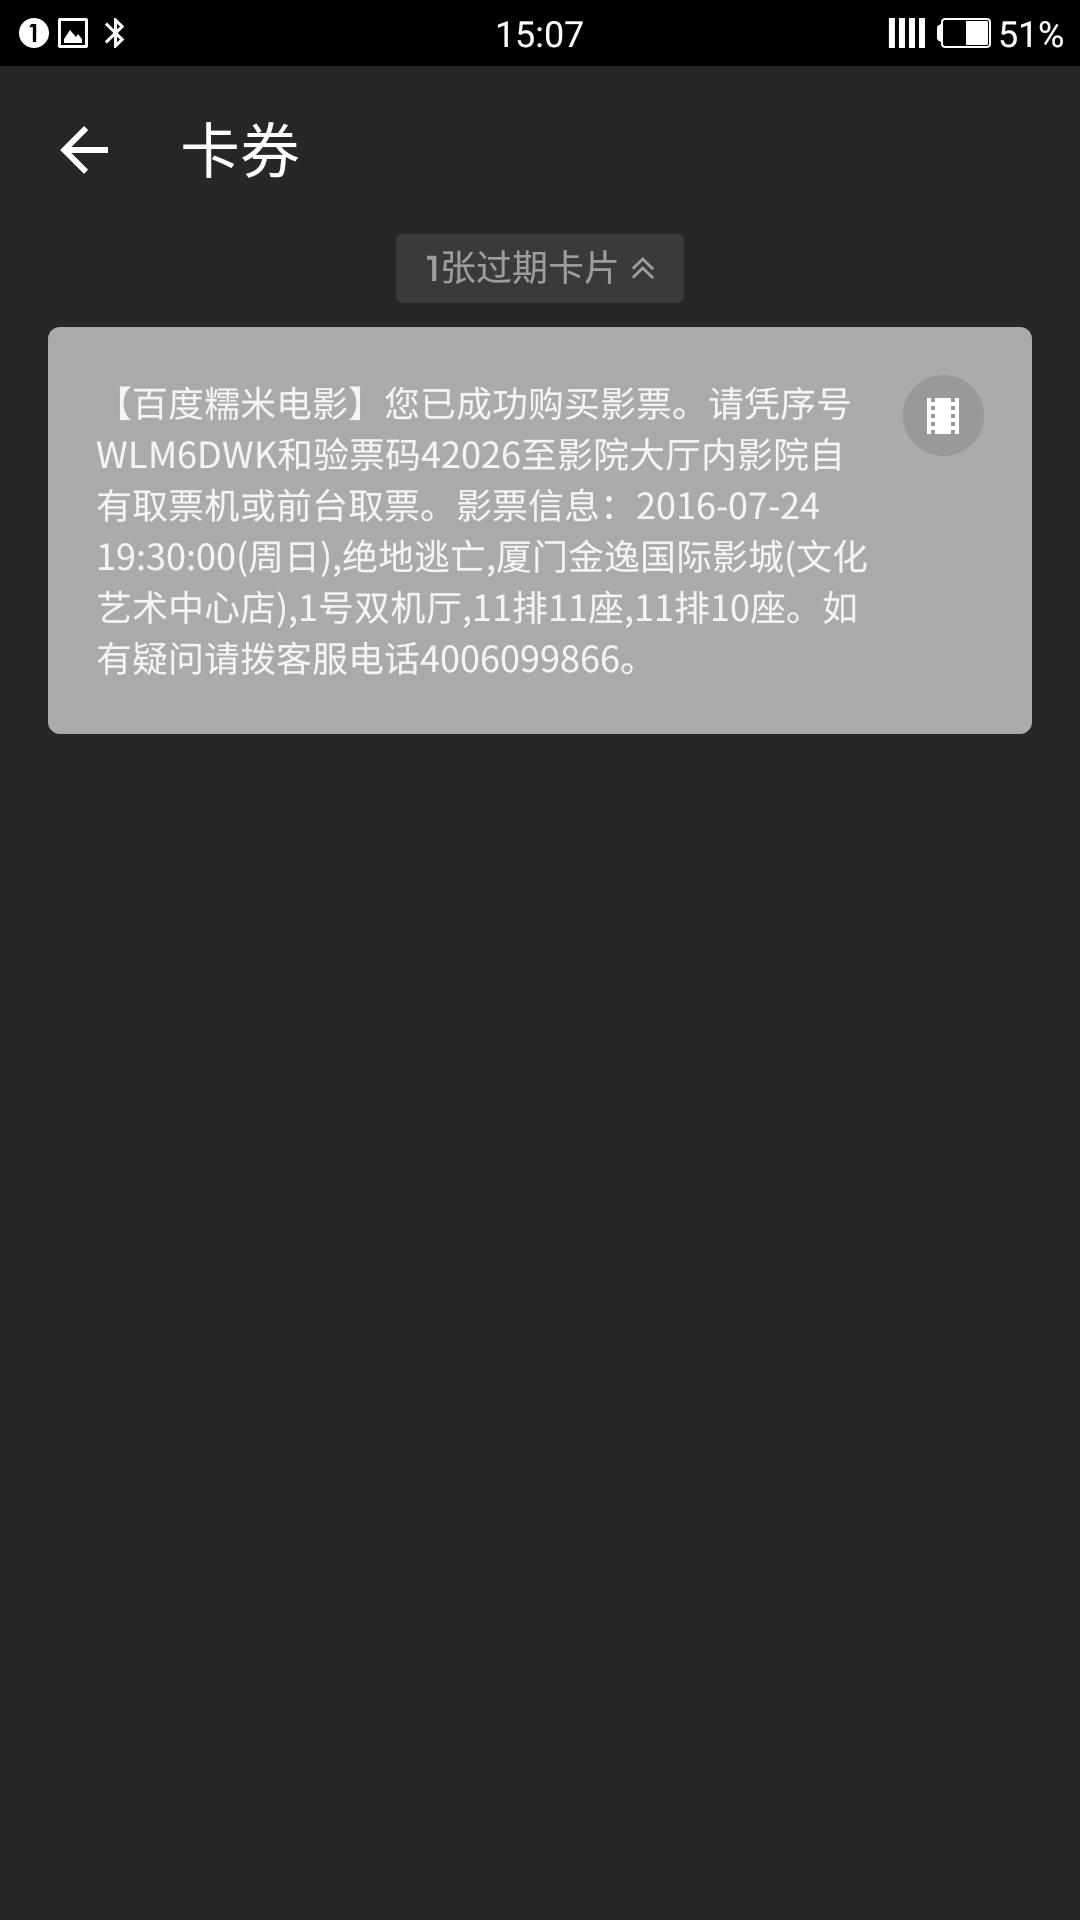 Screenshot_20160806-150735.png